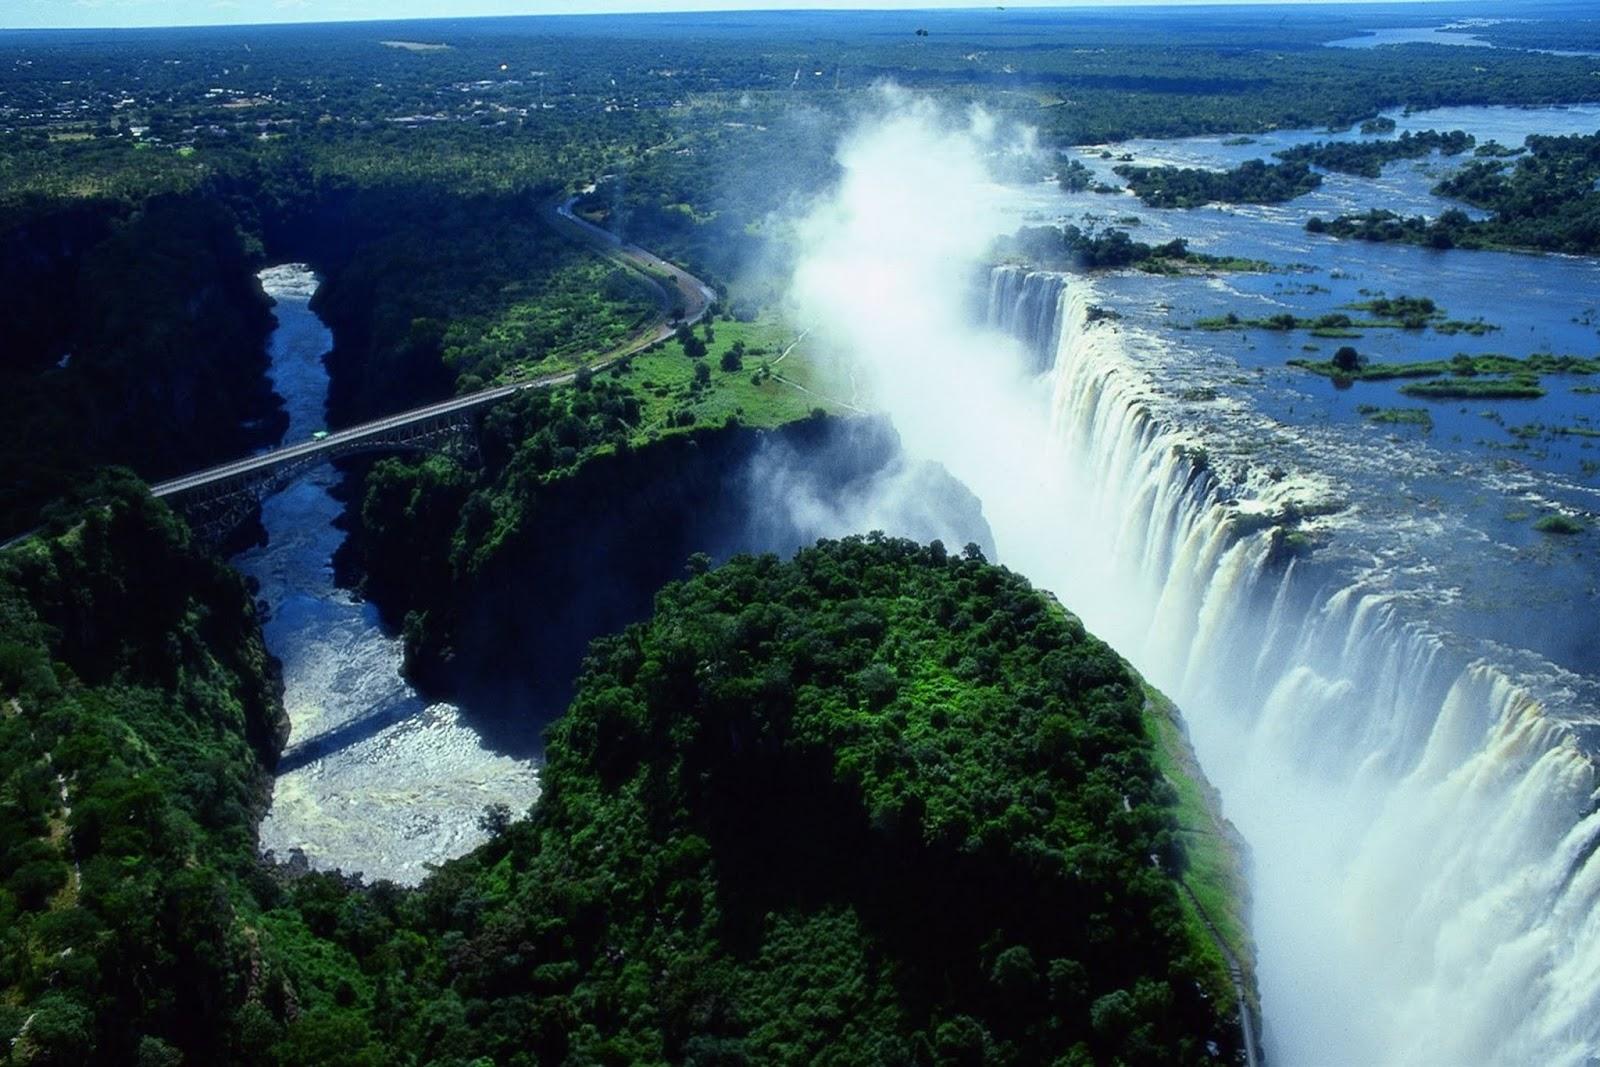 Uniqity: Menantang Adrenalin di Kolam Setan, Zambia